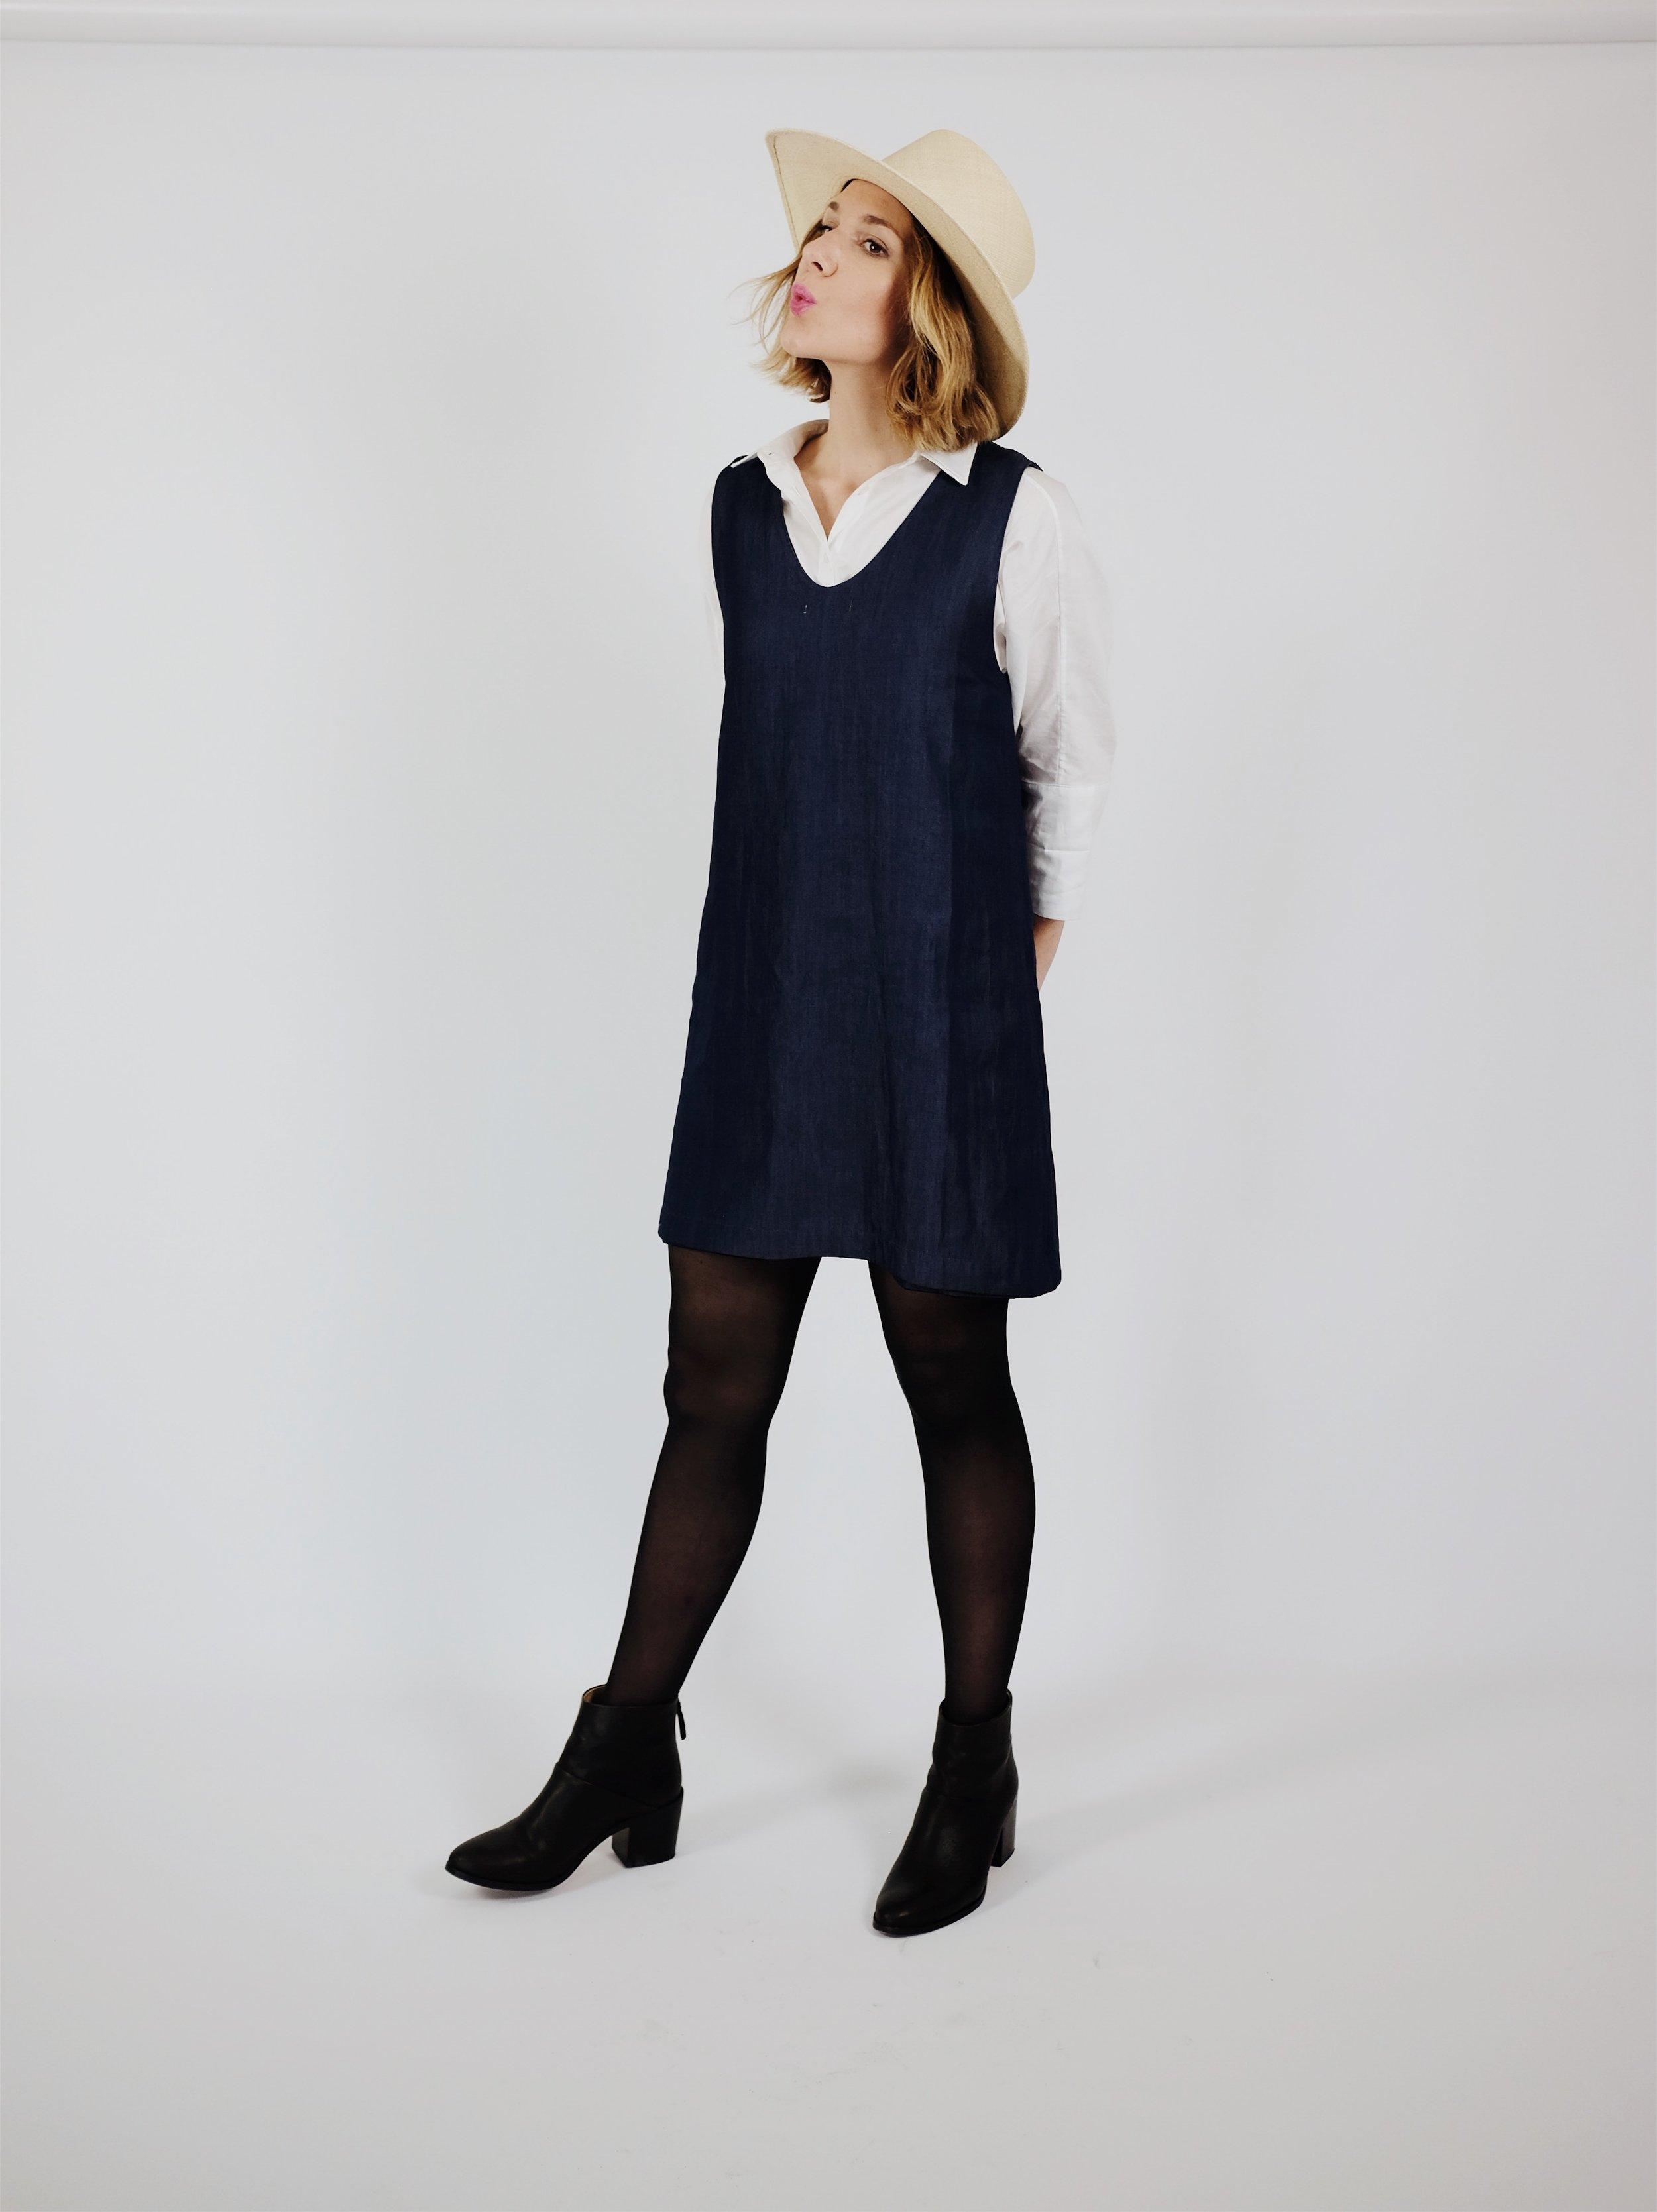 Vetta Reversible Dress | Minimal Capsule